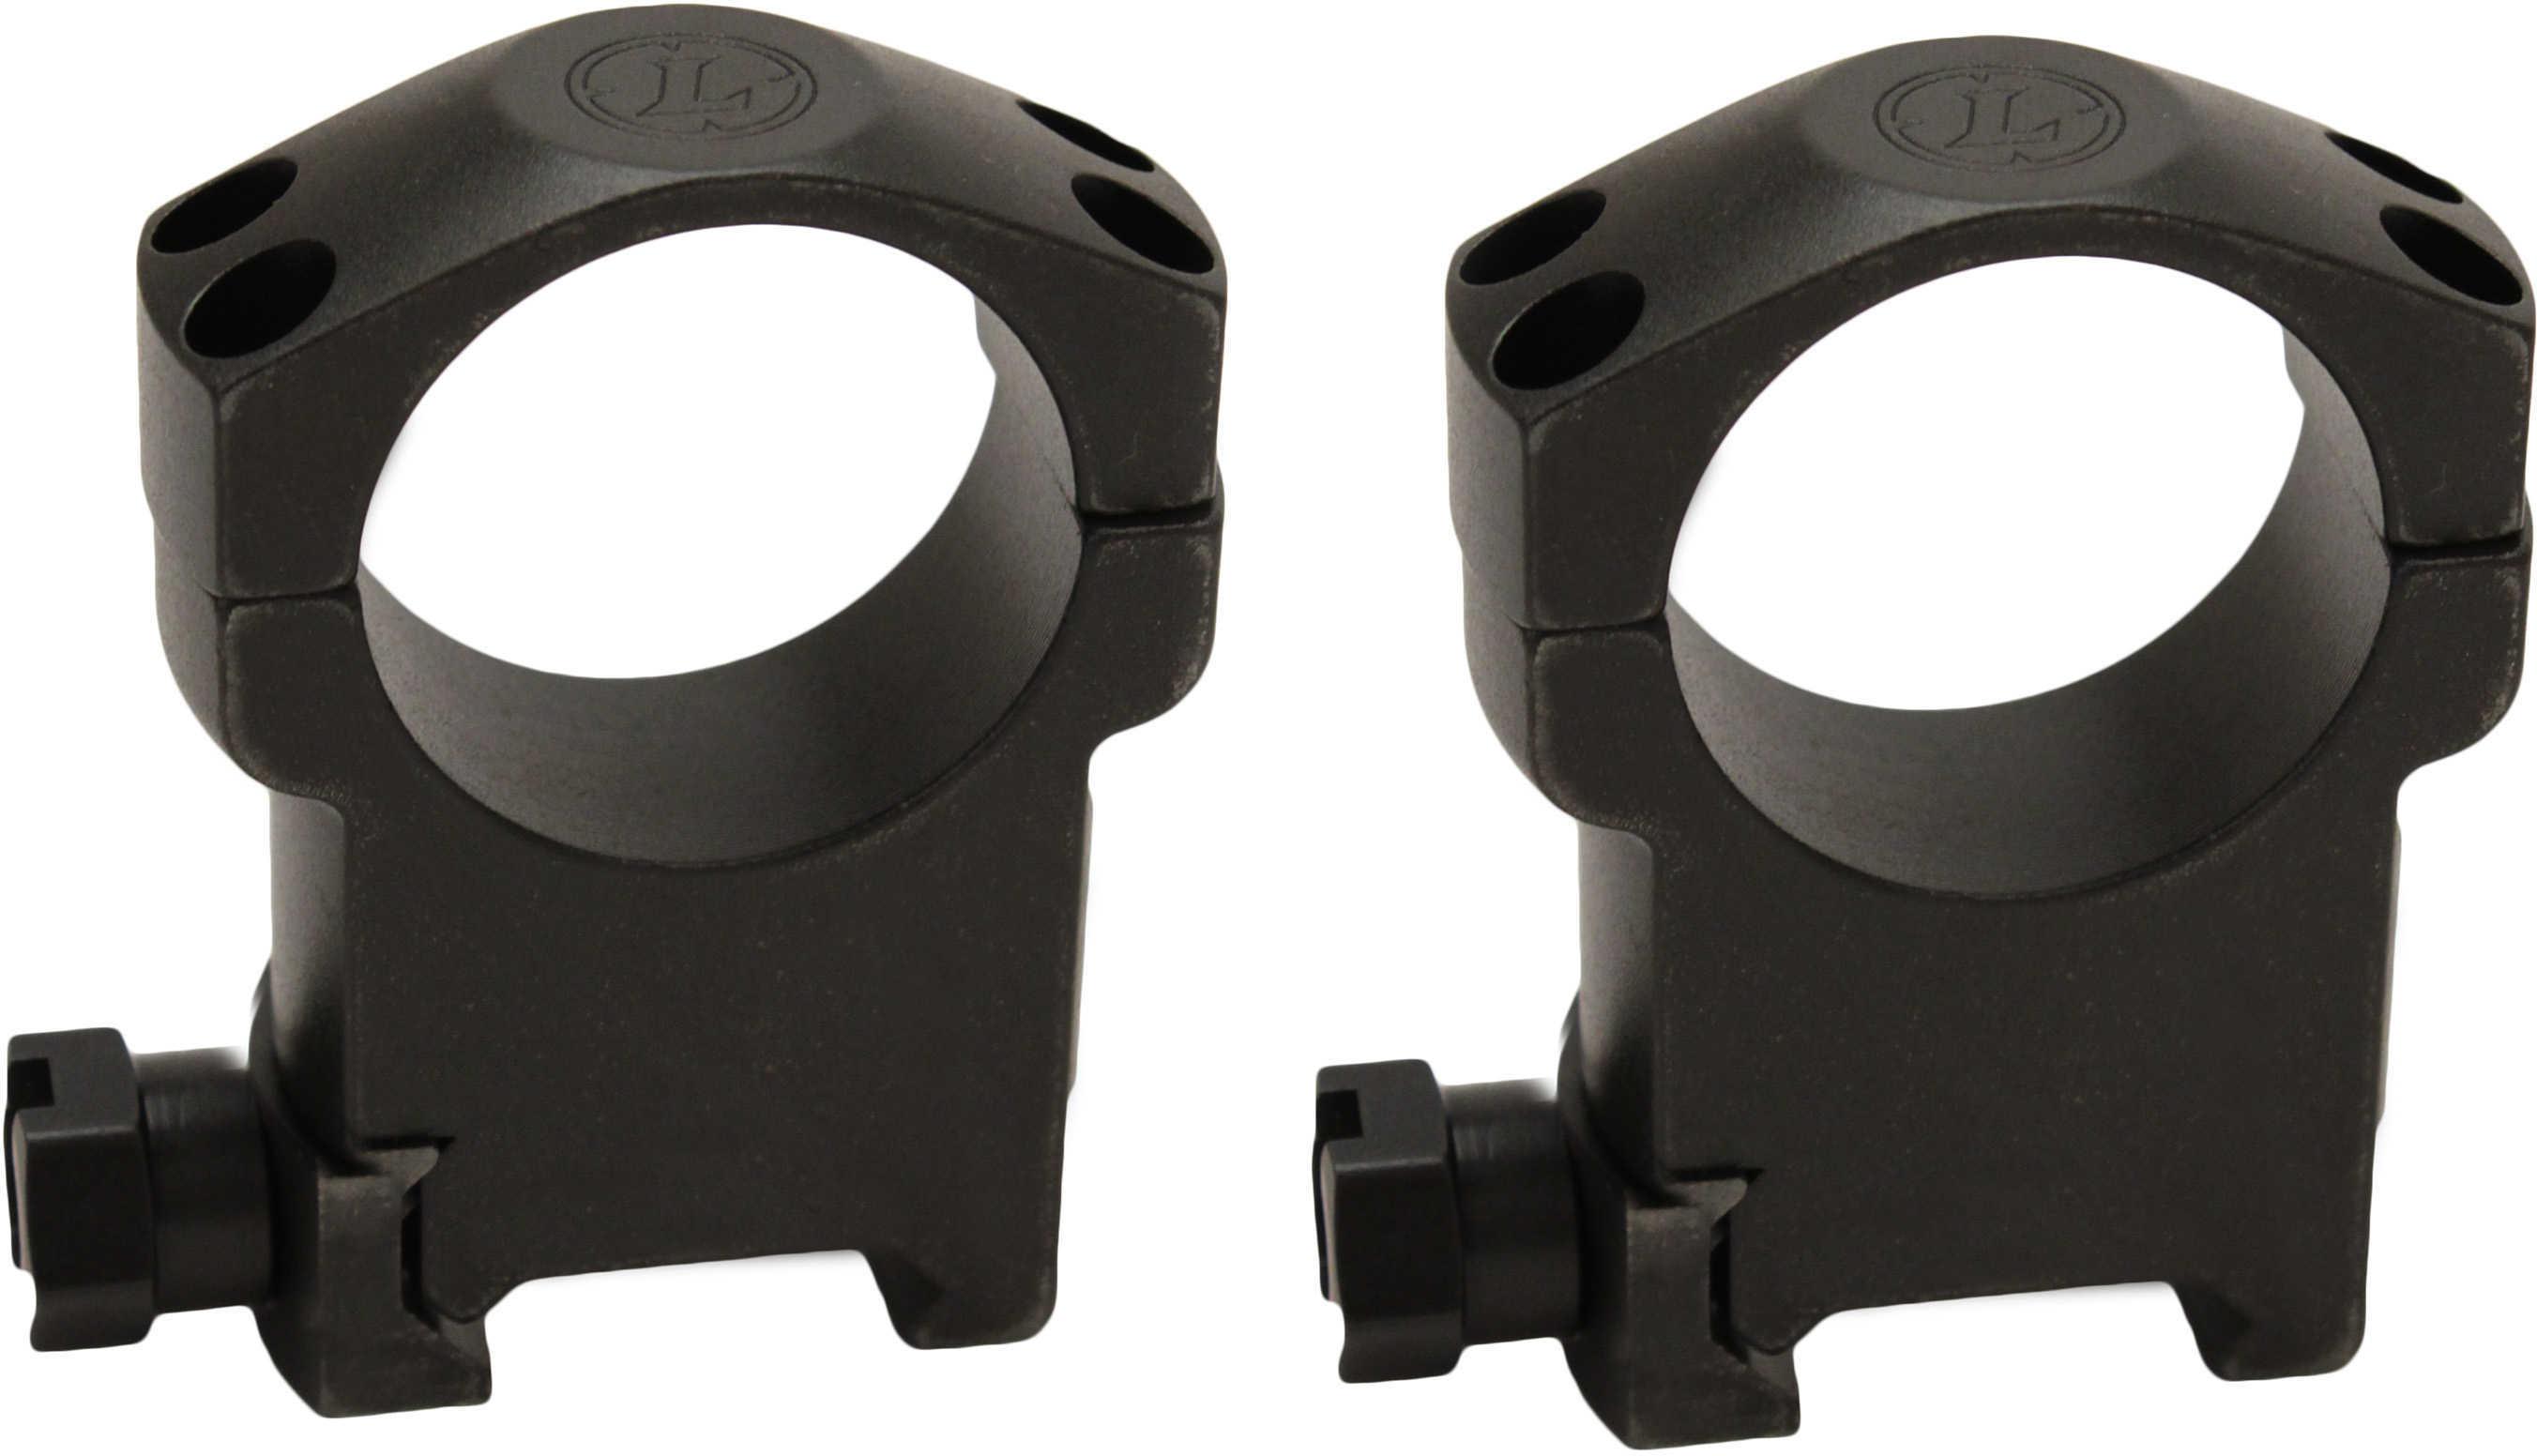 Leupold Mark 4 Rings 30mm Super High Matte Md: 60750